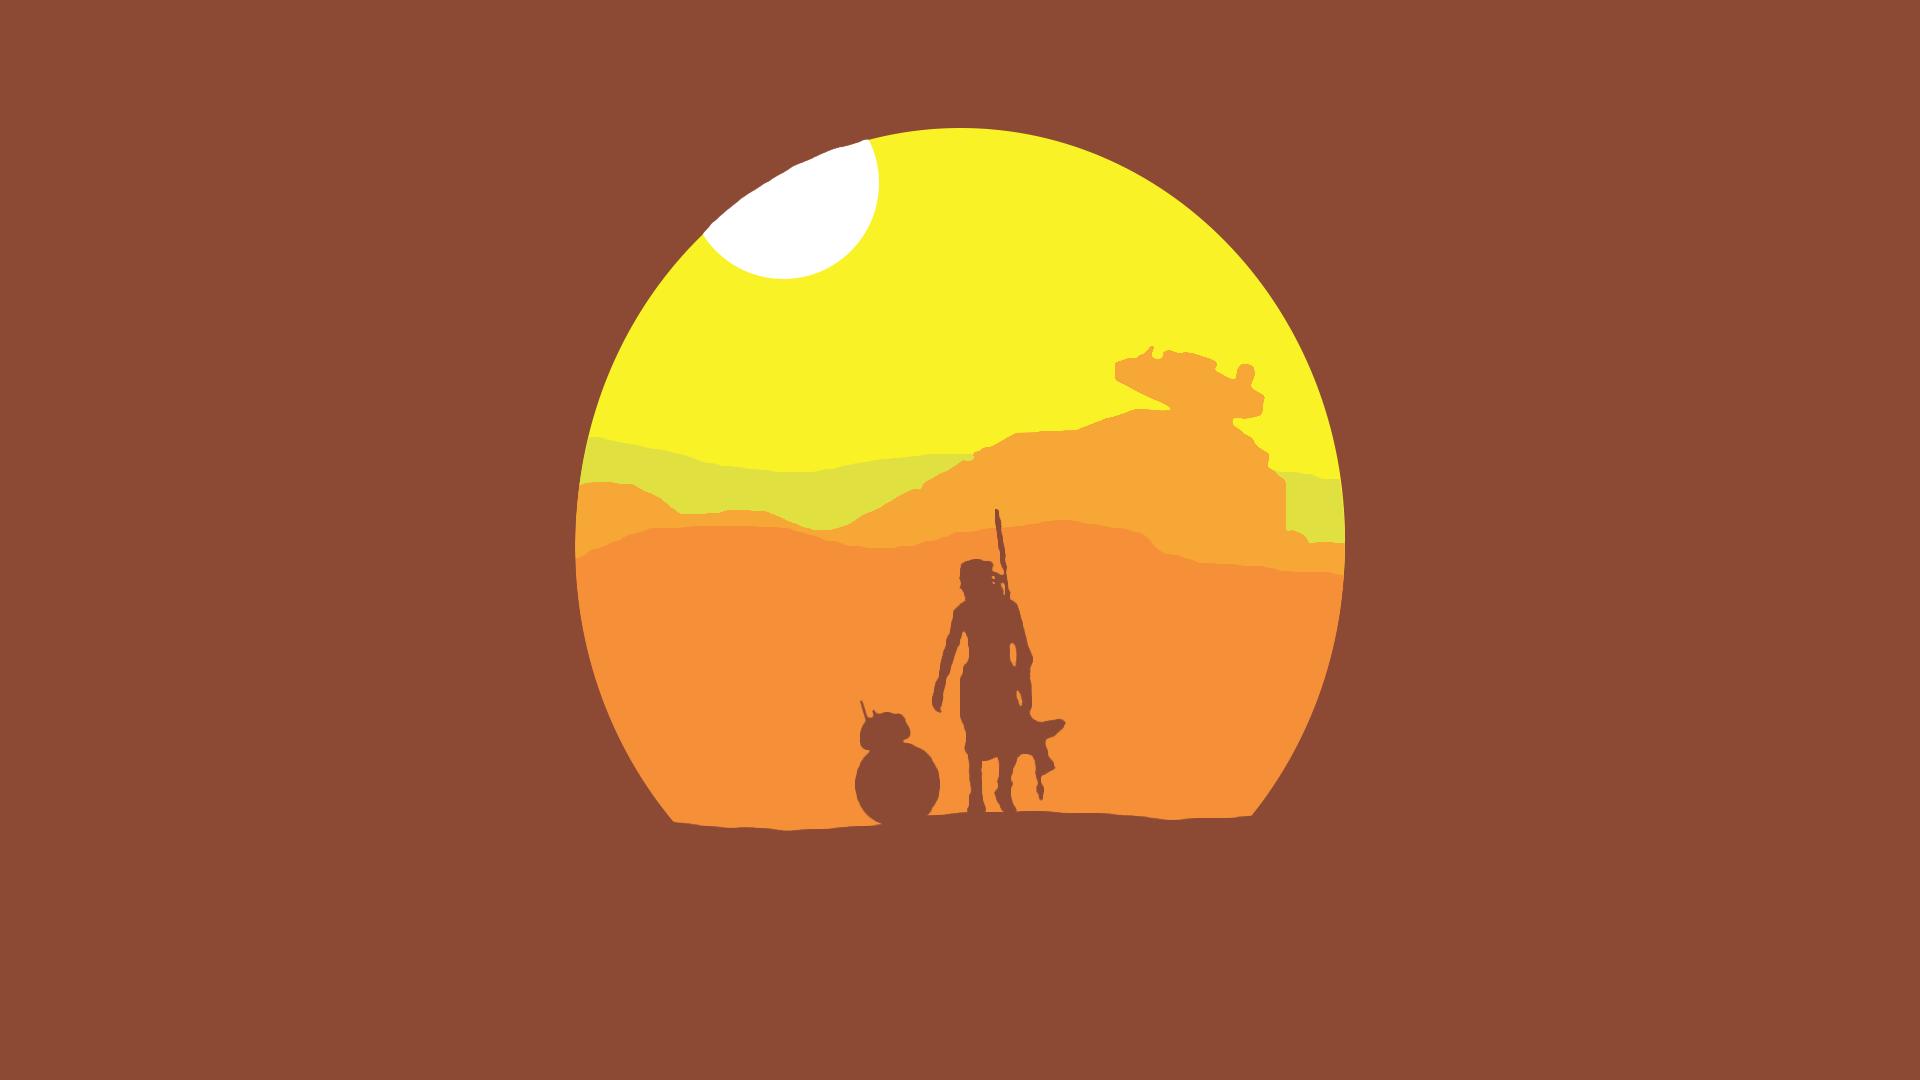 Minimal Star Wars Wallpapers in 2020 Star wars wallpaper